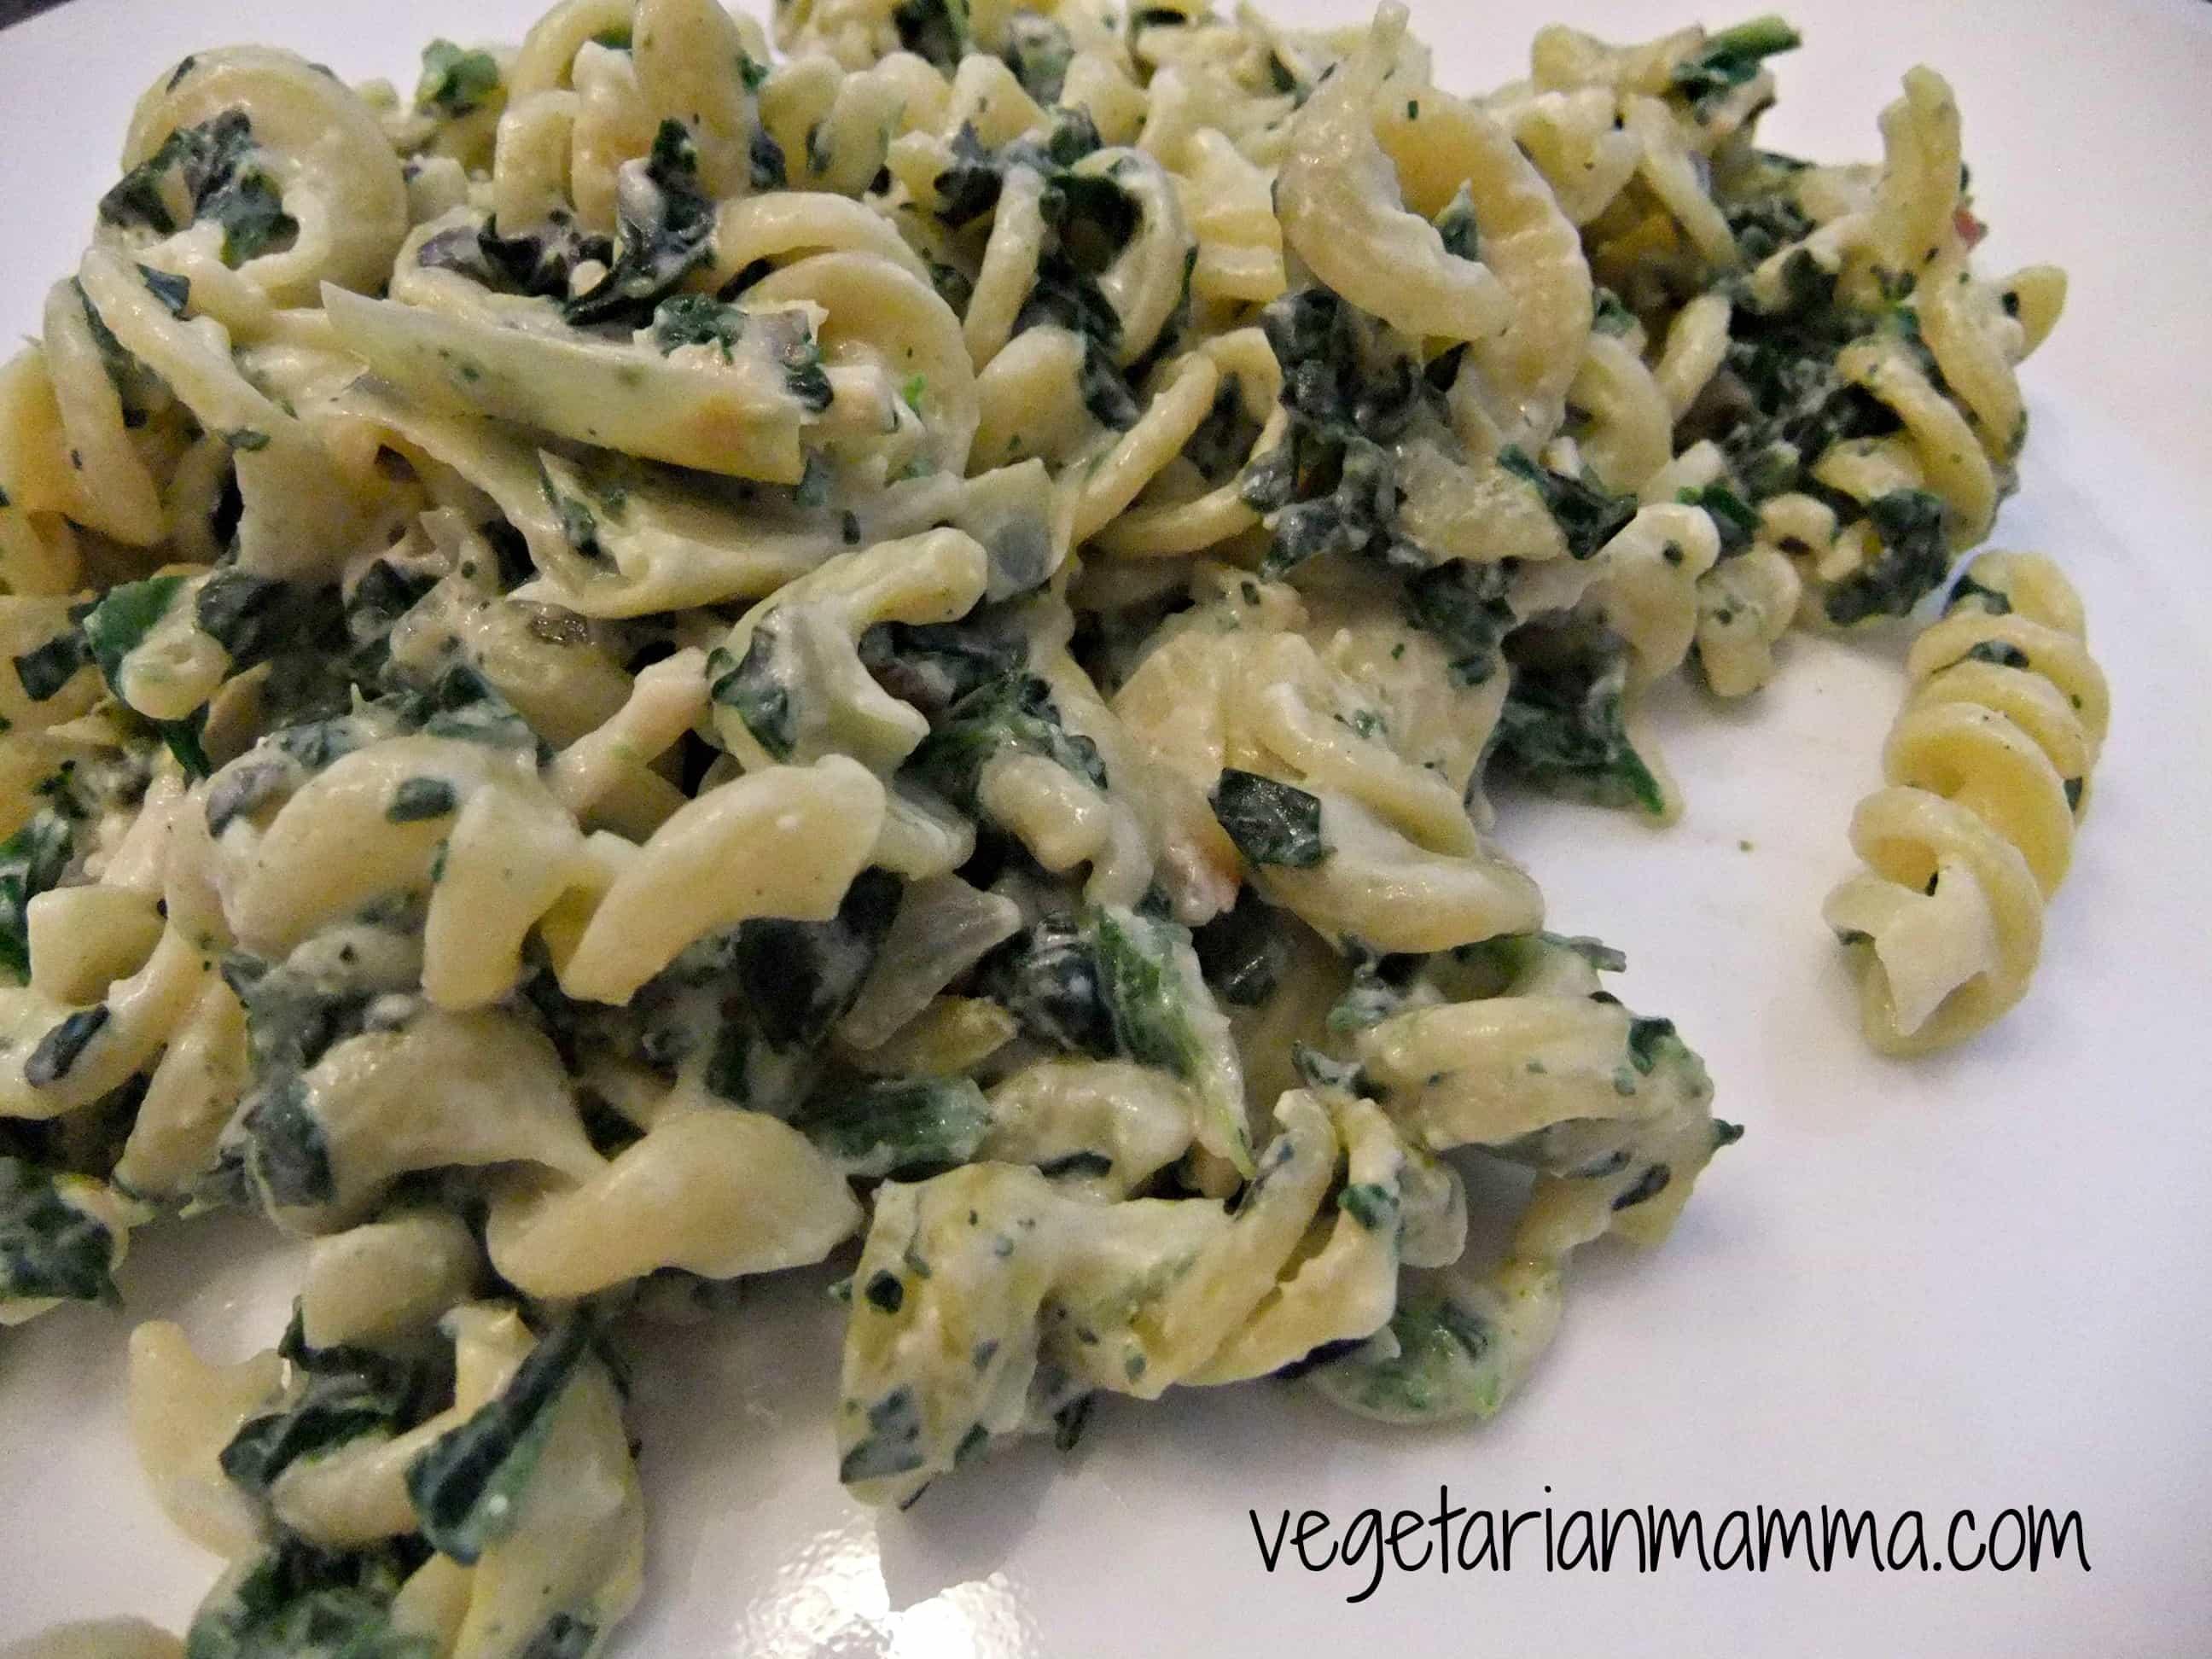 Creamy Spinach Artichoke Pasta Bake